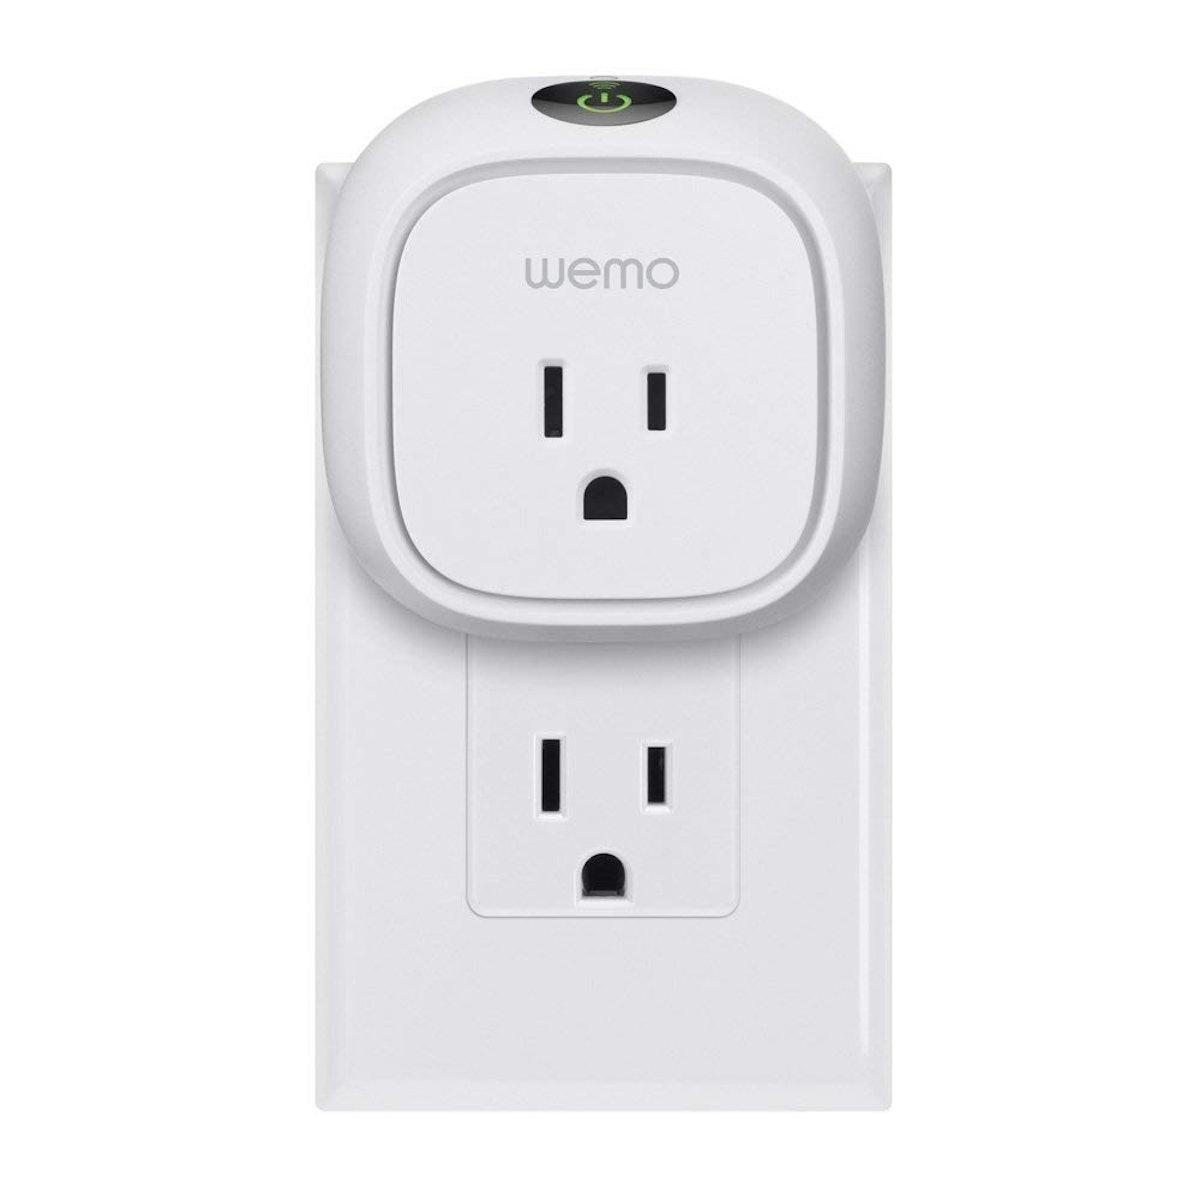 Belkin Wi-Fi WeMo Insight Smart Plug